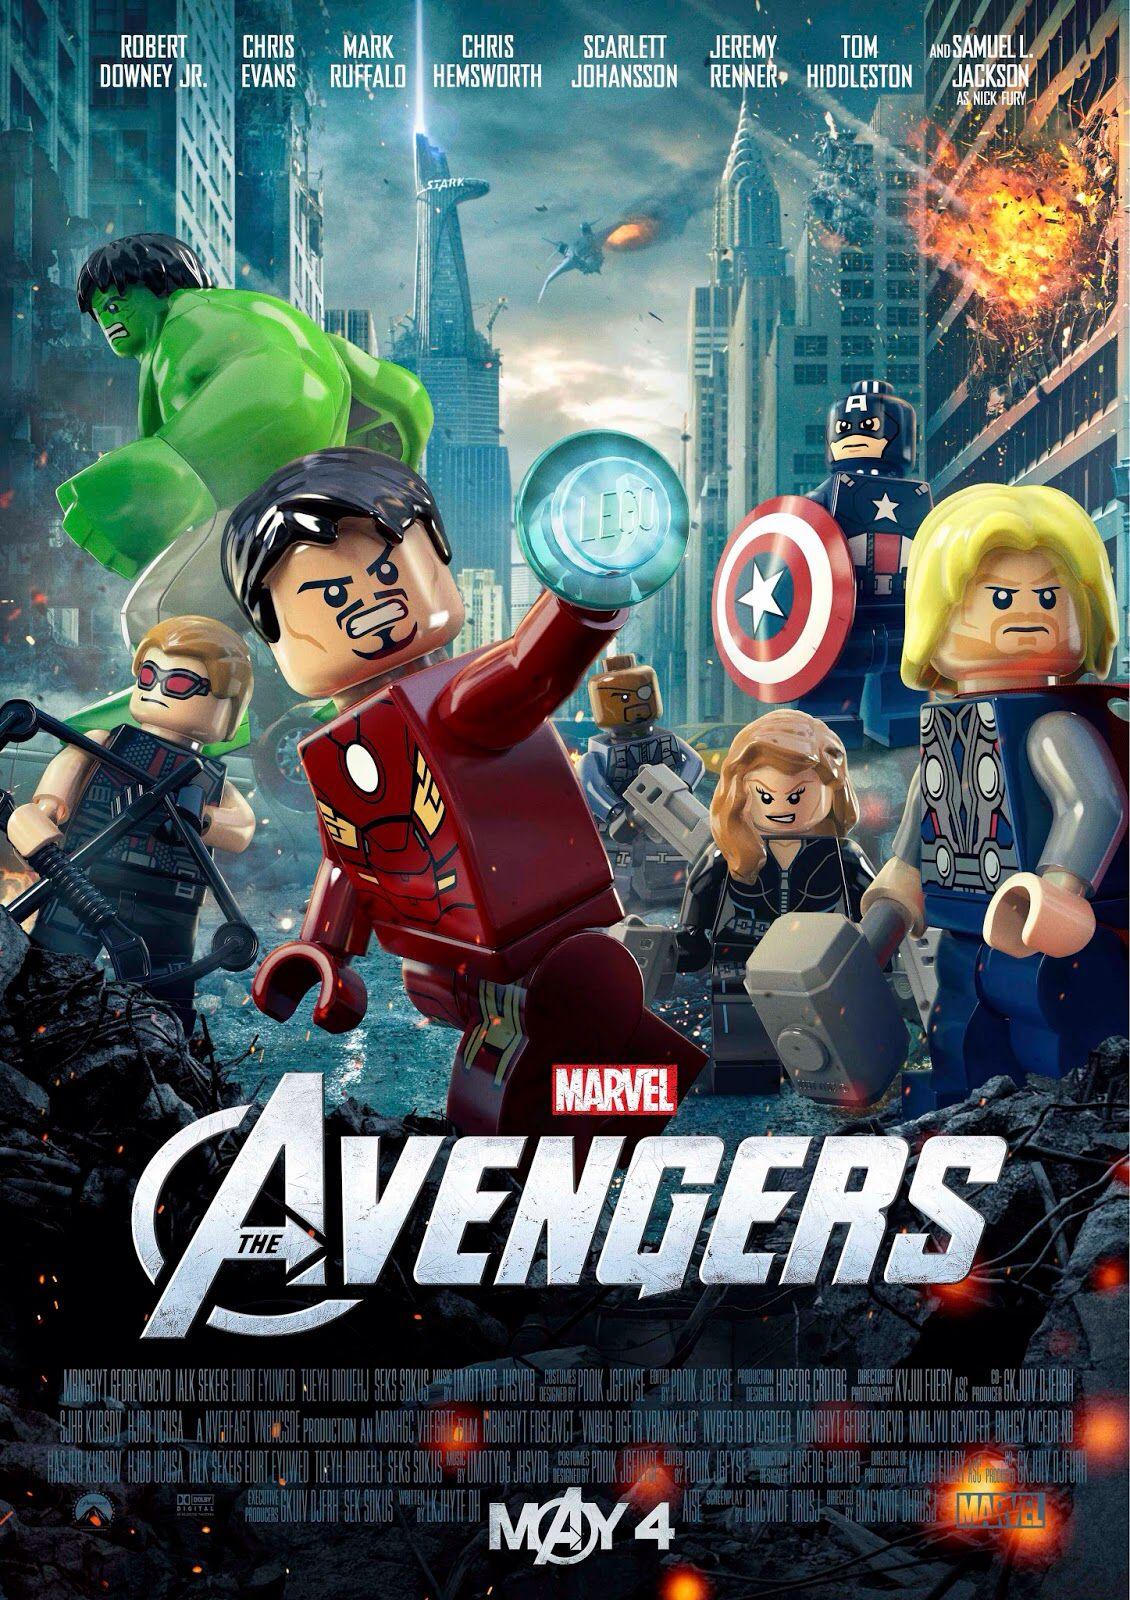 Lego avengers wallpaper iphone legos pinterest lego avengers wallpaper iphone voltagebd Gallery